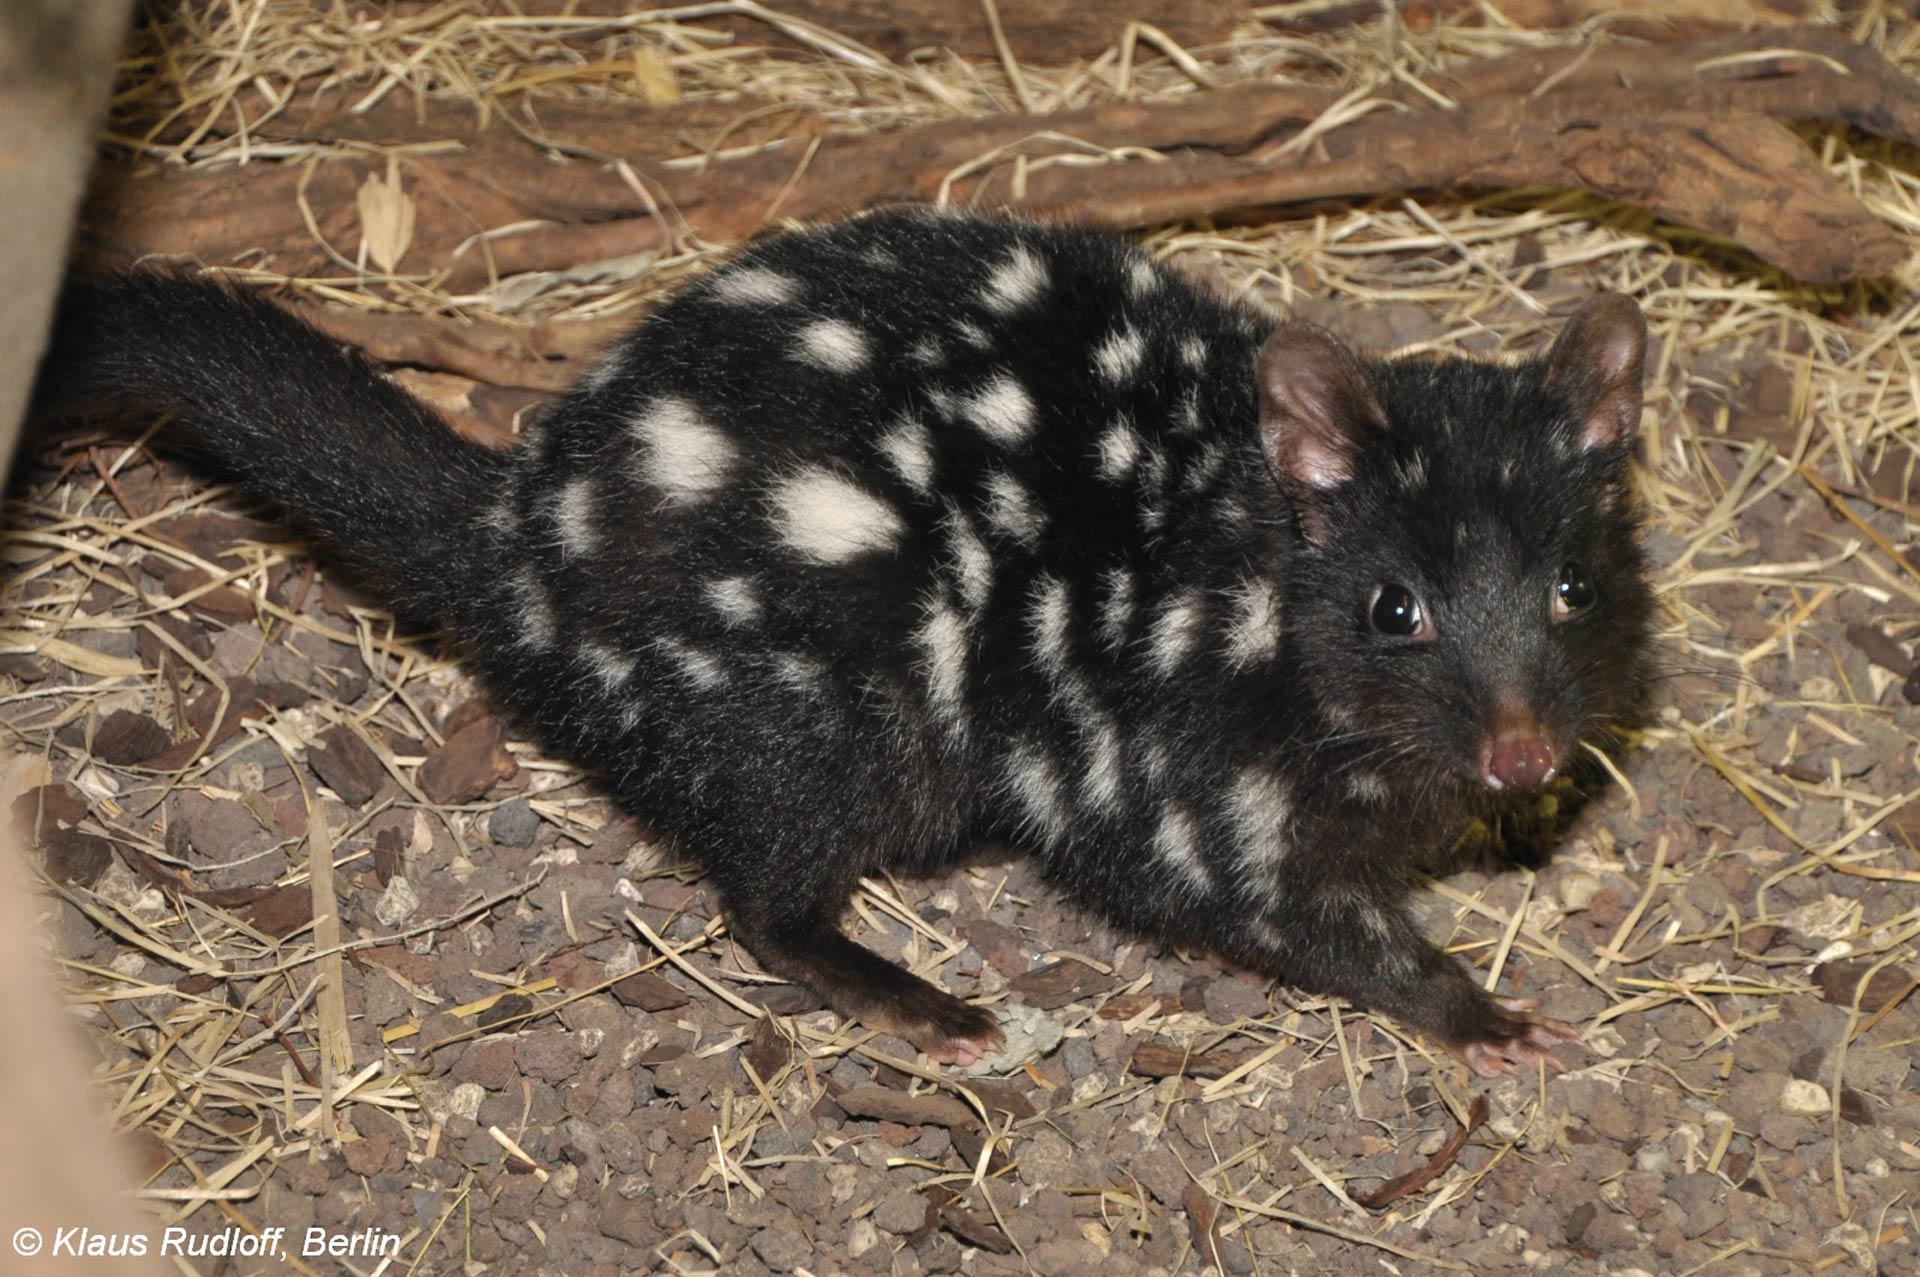 Eastern quoll reintroductions confirmed for mainland australia - Conjour In Situ Update - Rewilding Australia